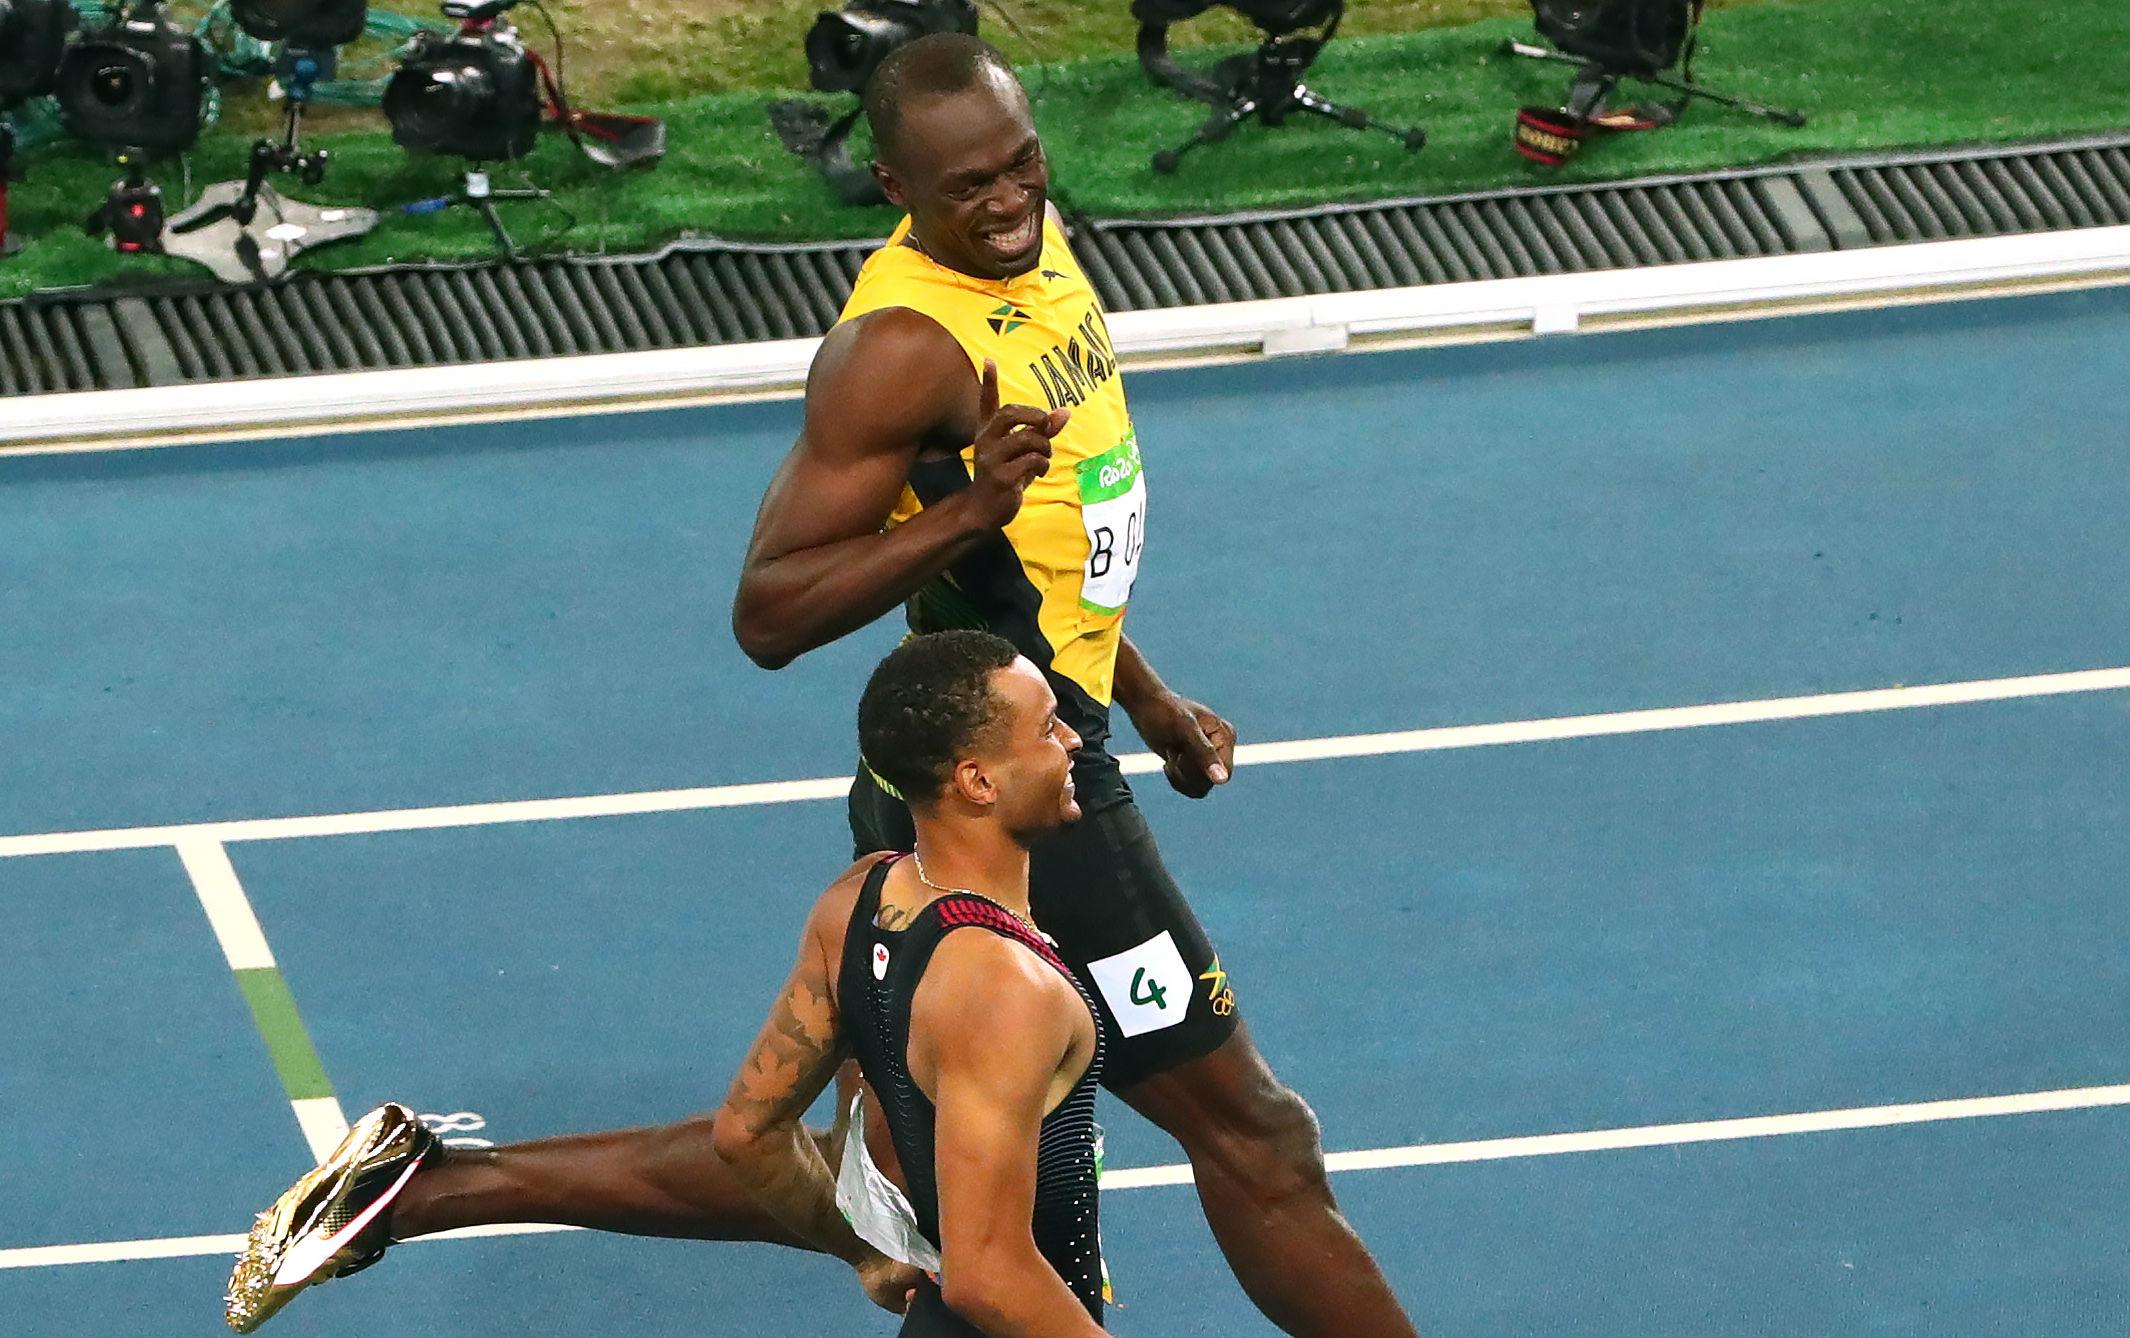 d954ebace4d09c Usain Bolt s Gold Puma Spikes for the Olympics Laugh